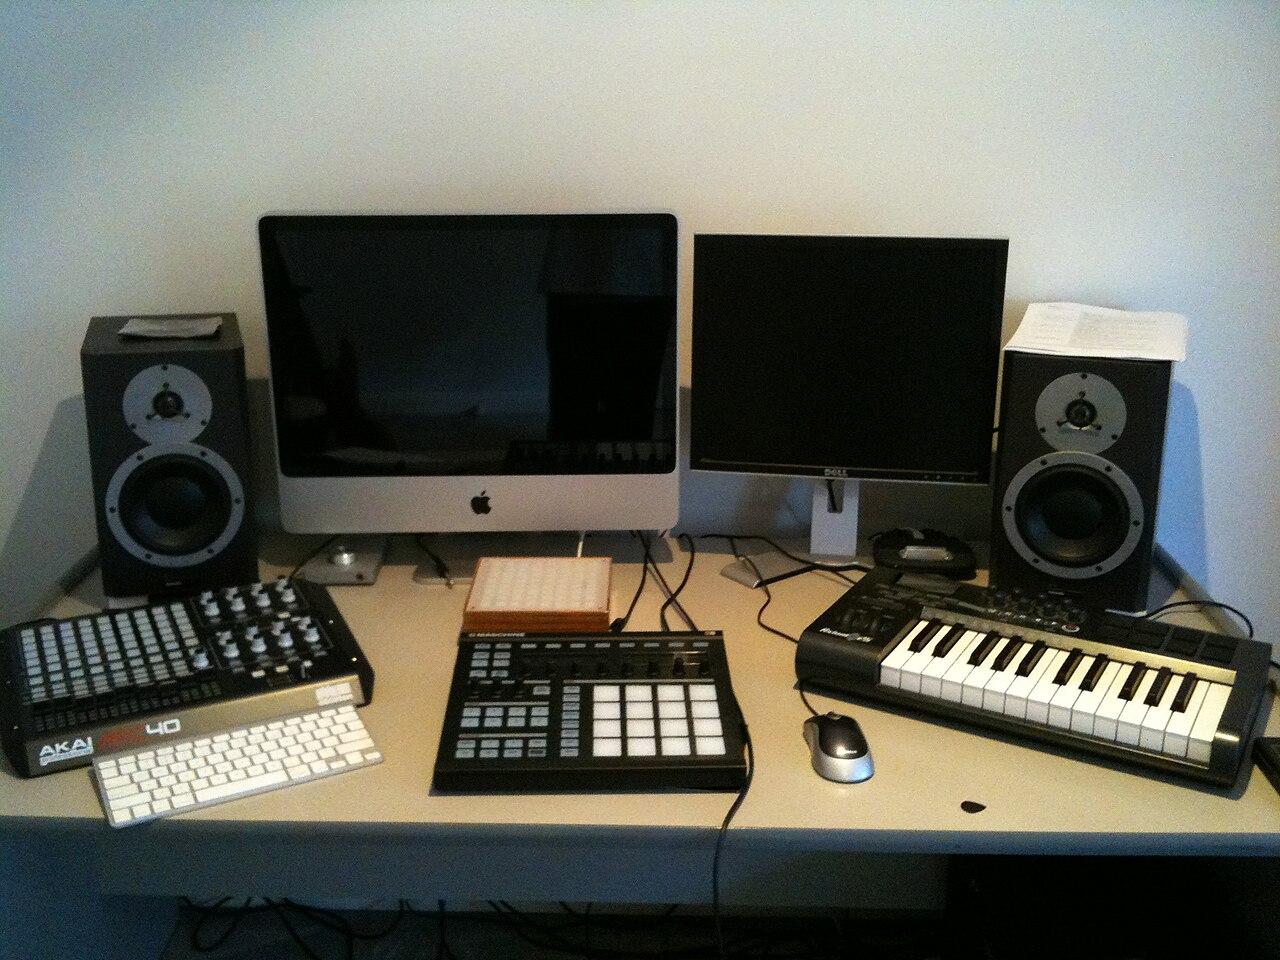 File Drvinay S Studio Desktop The Backbone Of It All Jpg